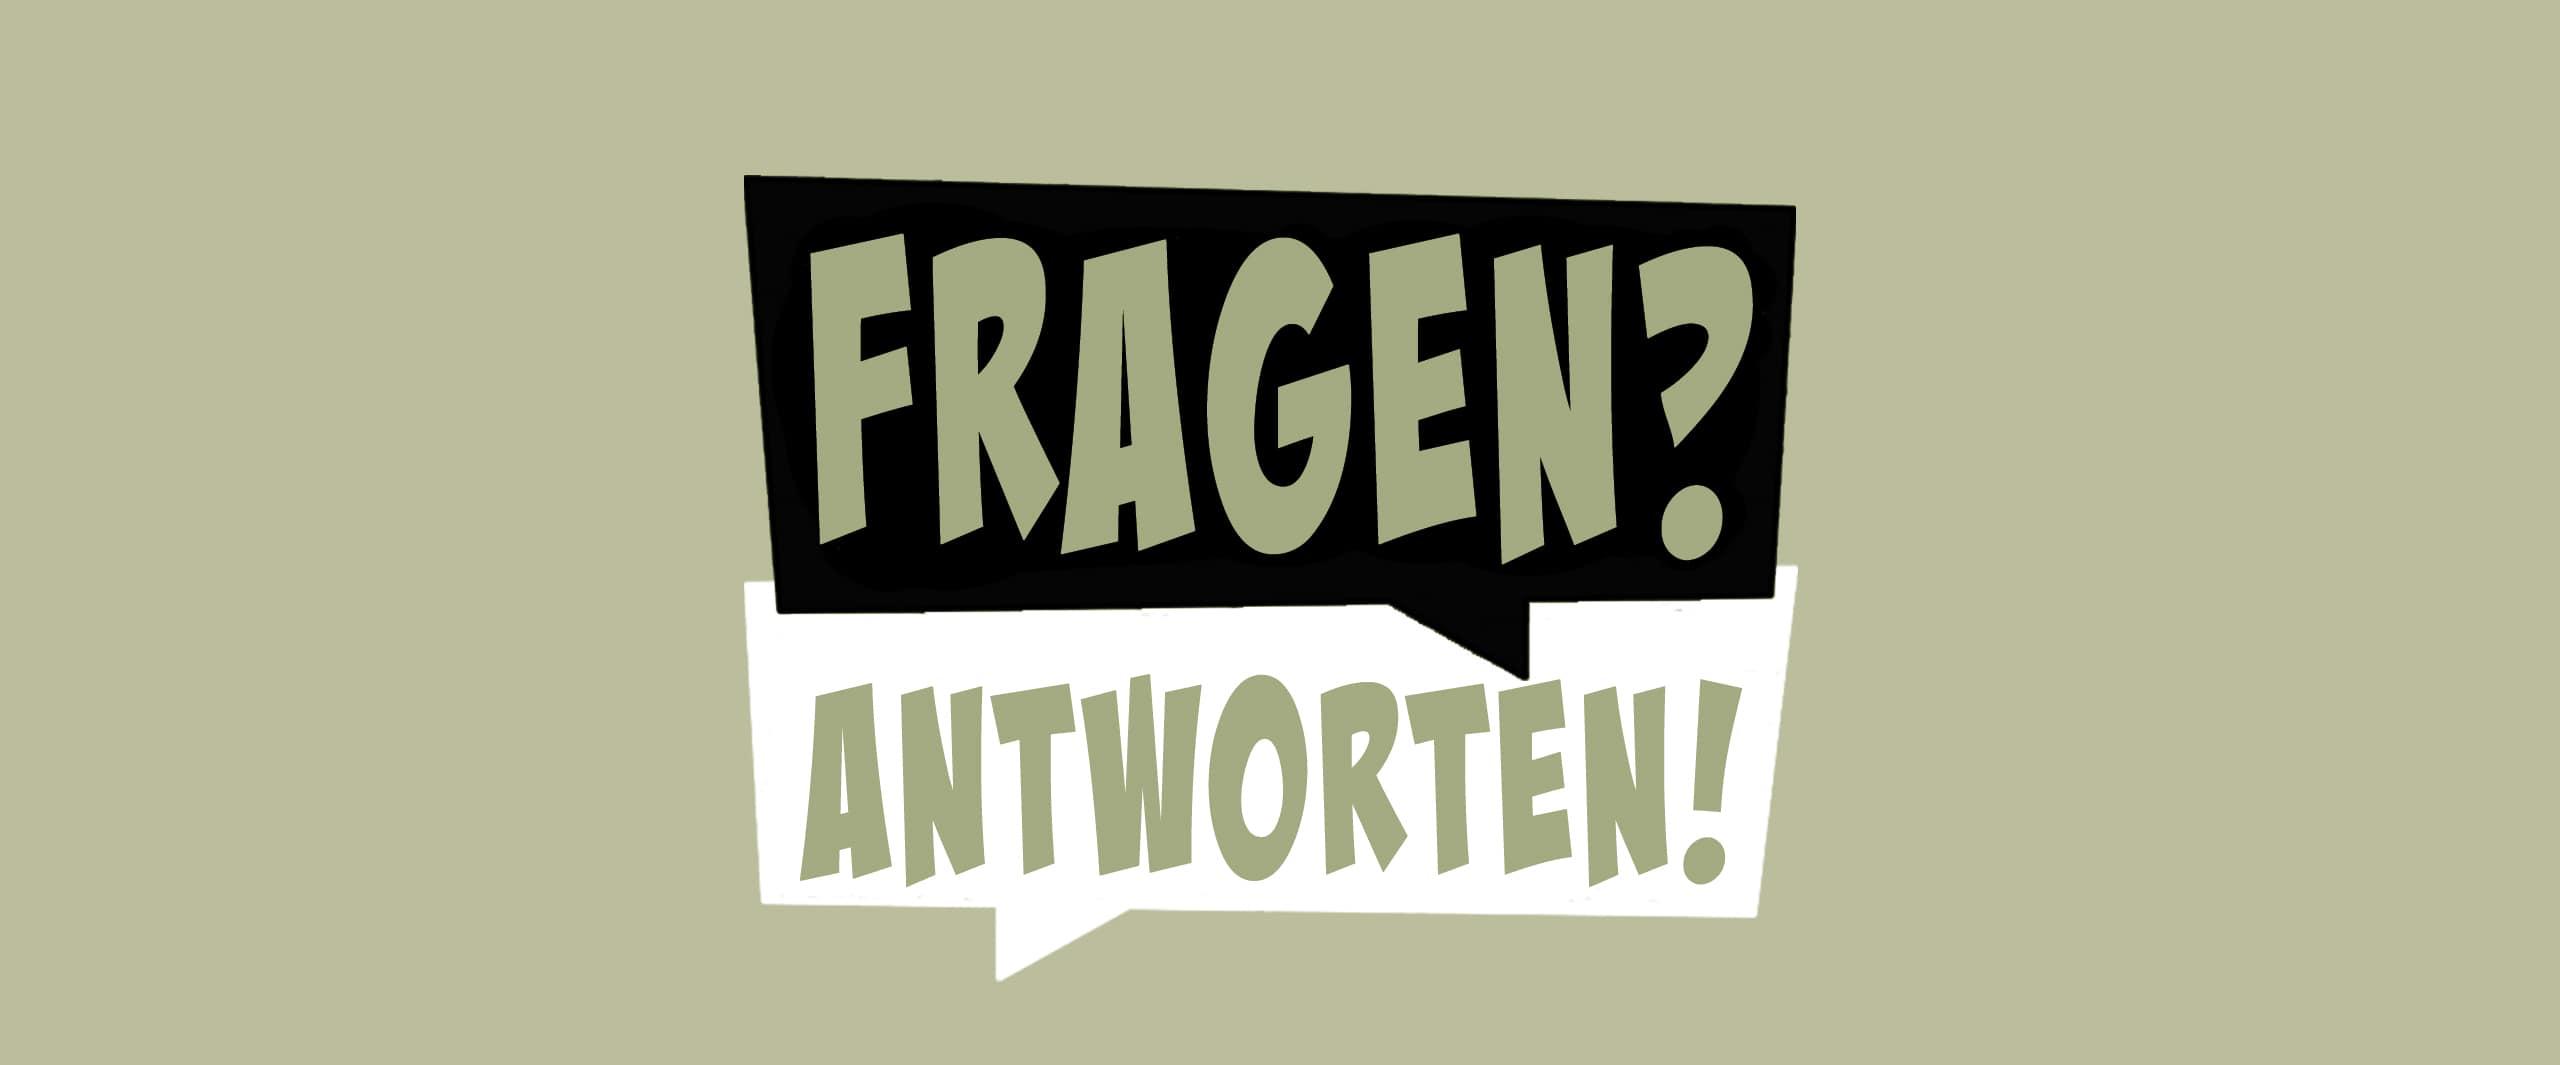 faq antworten Produkten plankton holland